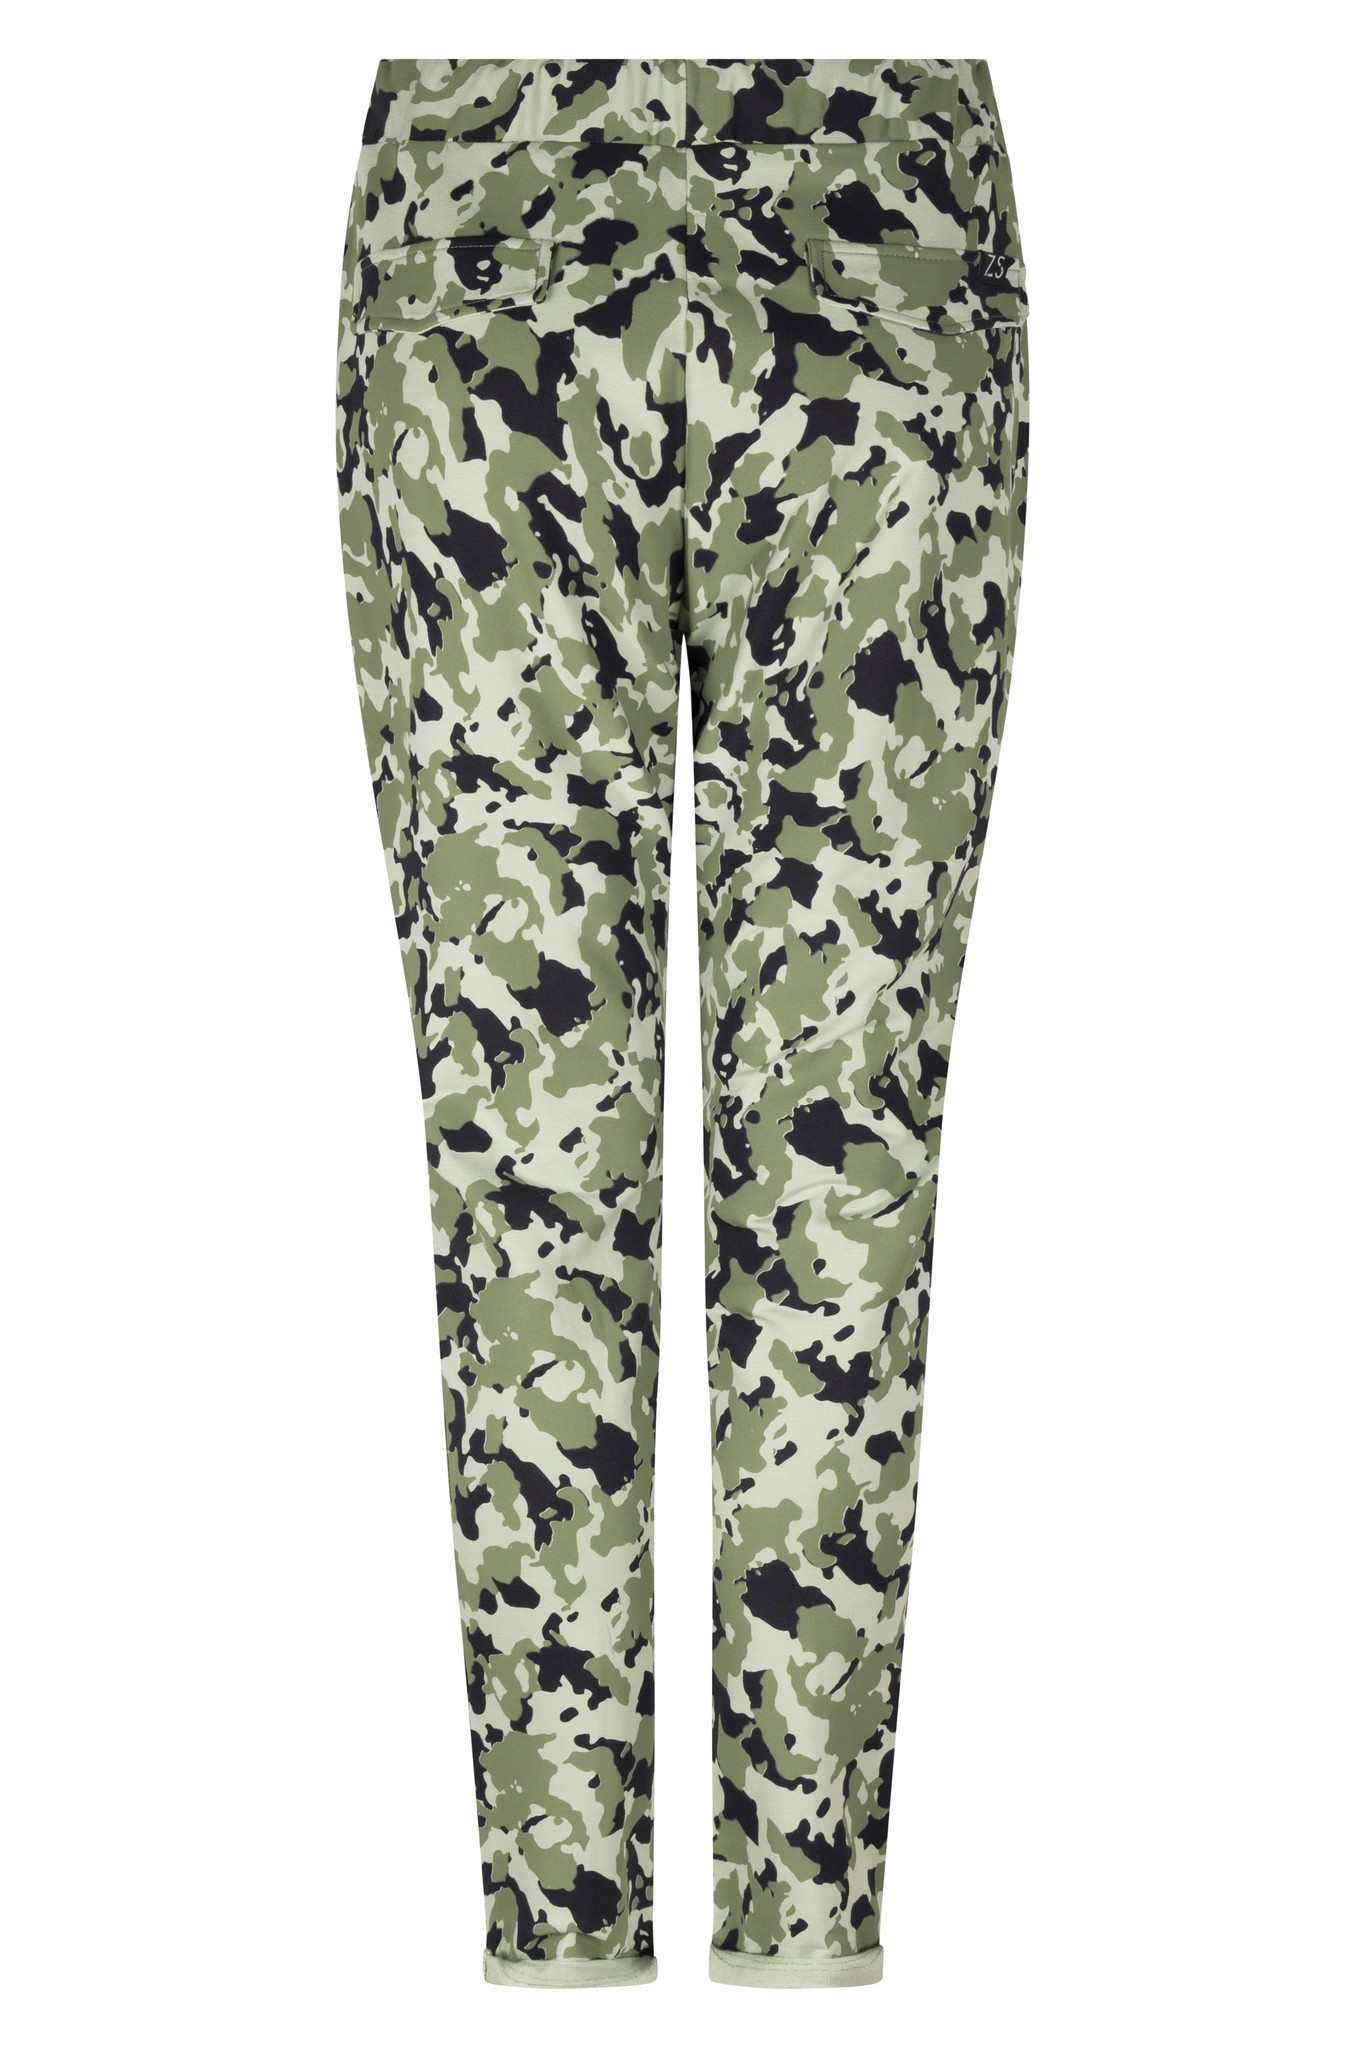 Zoso Zoso Monique Camouflage sweat pant navy/green